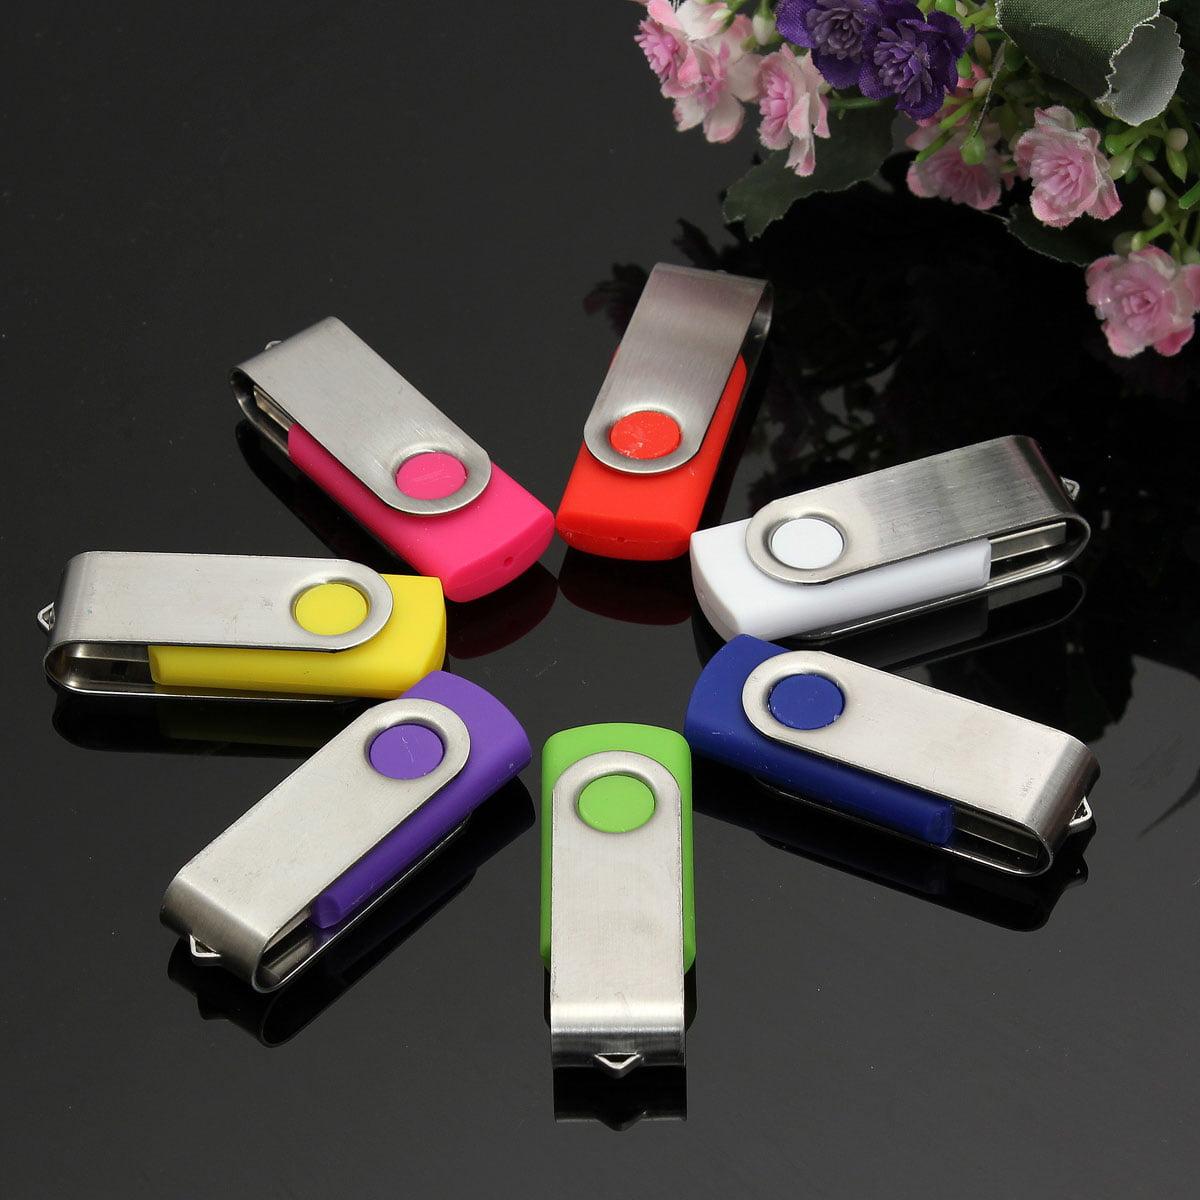 512 MB Mo CLE USB 2.0 key Flash Drive Mémoire U-Disk Stylo Usb Flash Thumb Pliable Cadeau